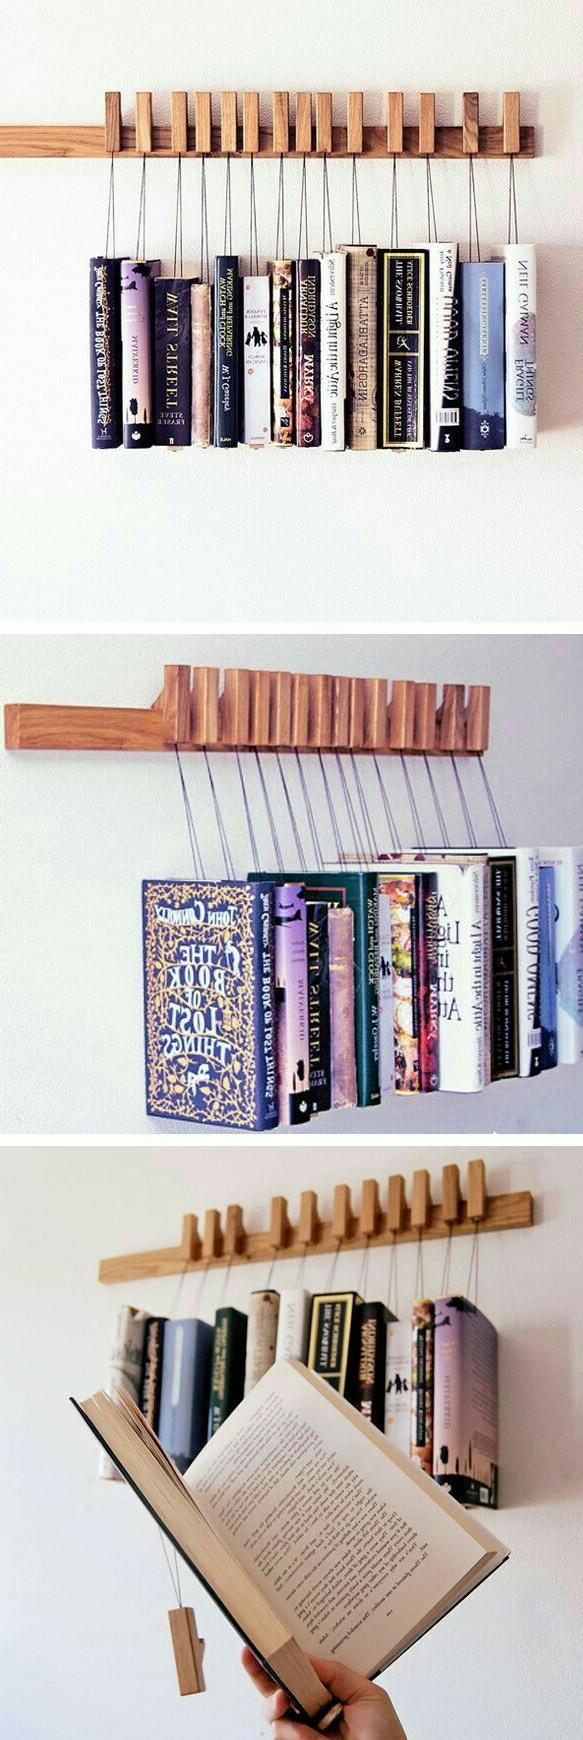 Book Racks Image Sumaiyya On Creativity Wooden Books